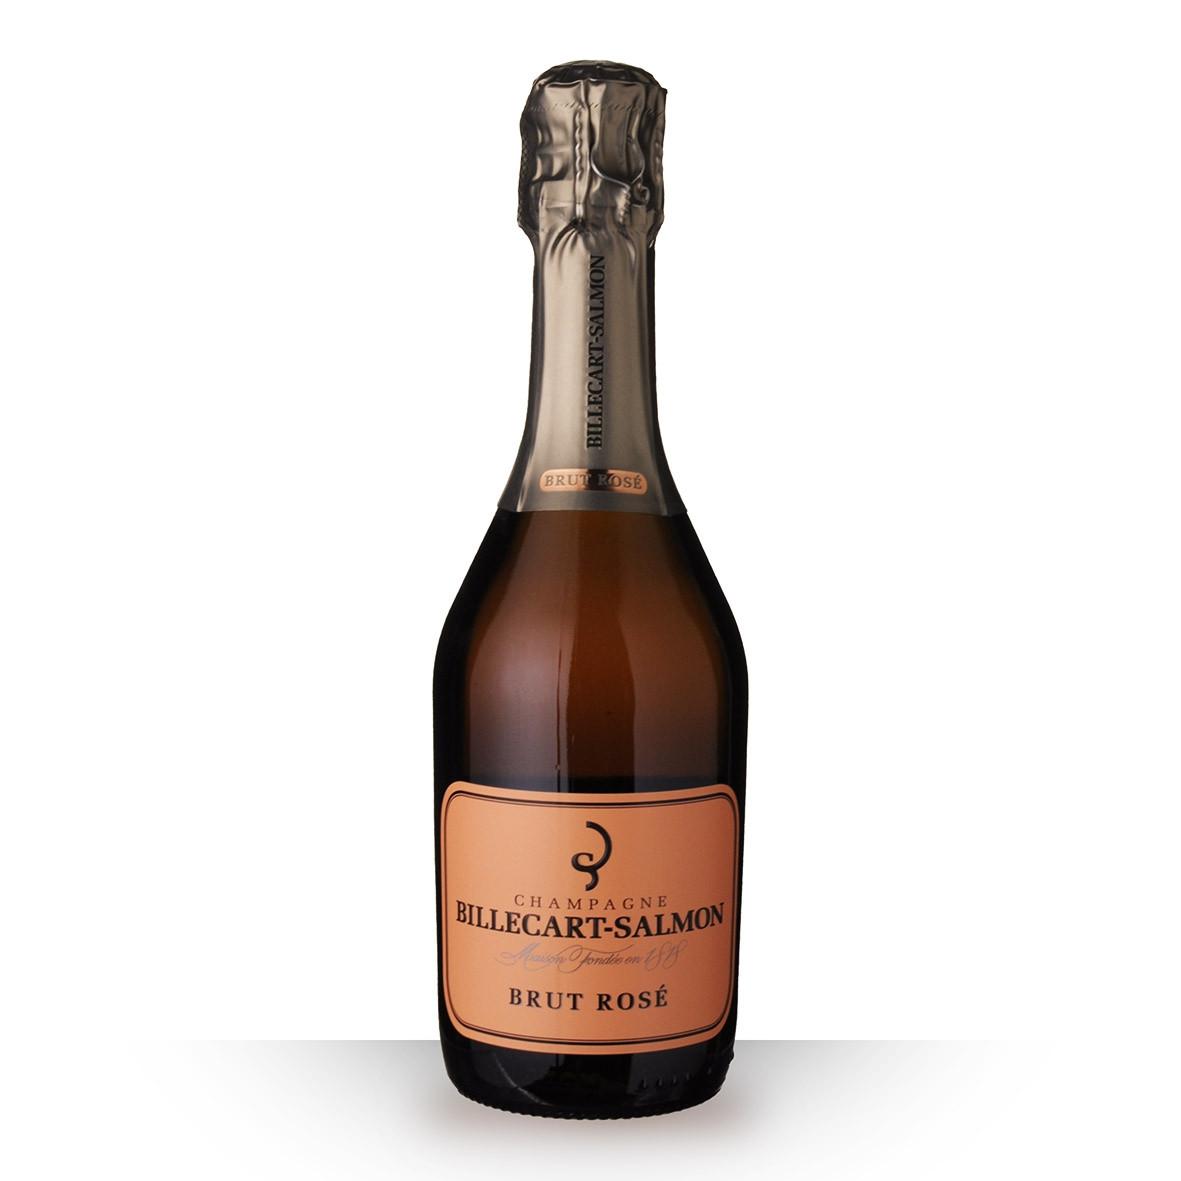 Champagne Billecart-Salmon Brut Rosé 37,5cl www.odyssee-vins.com